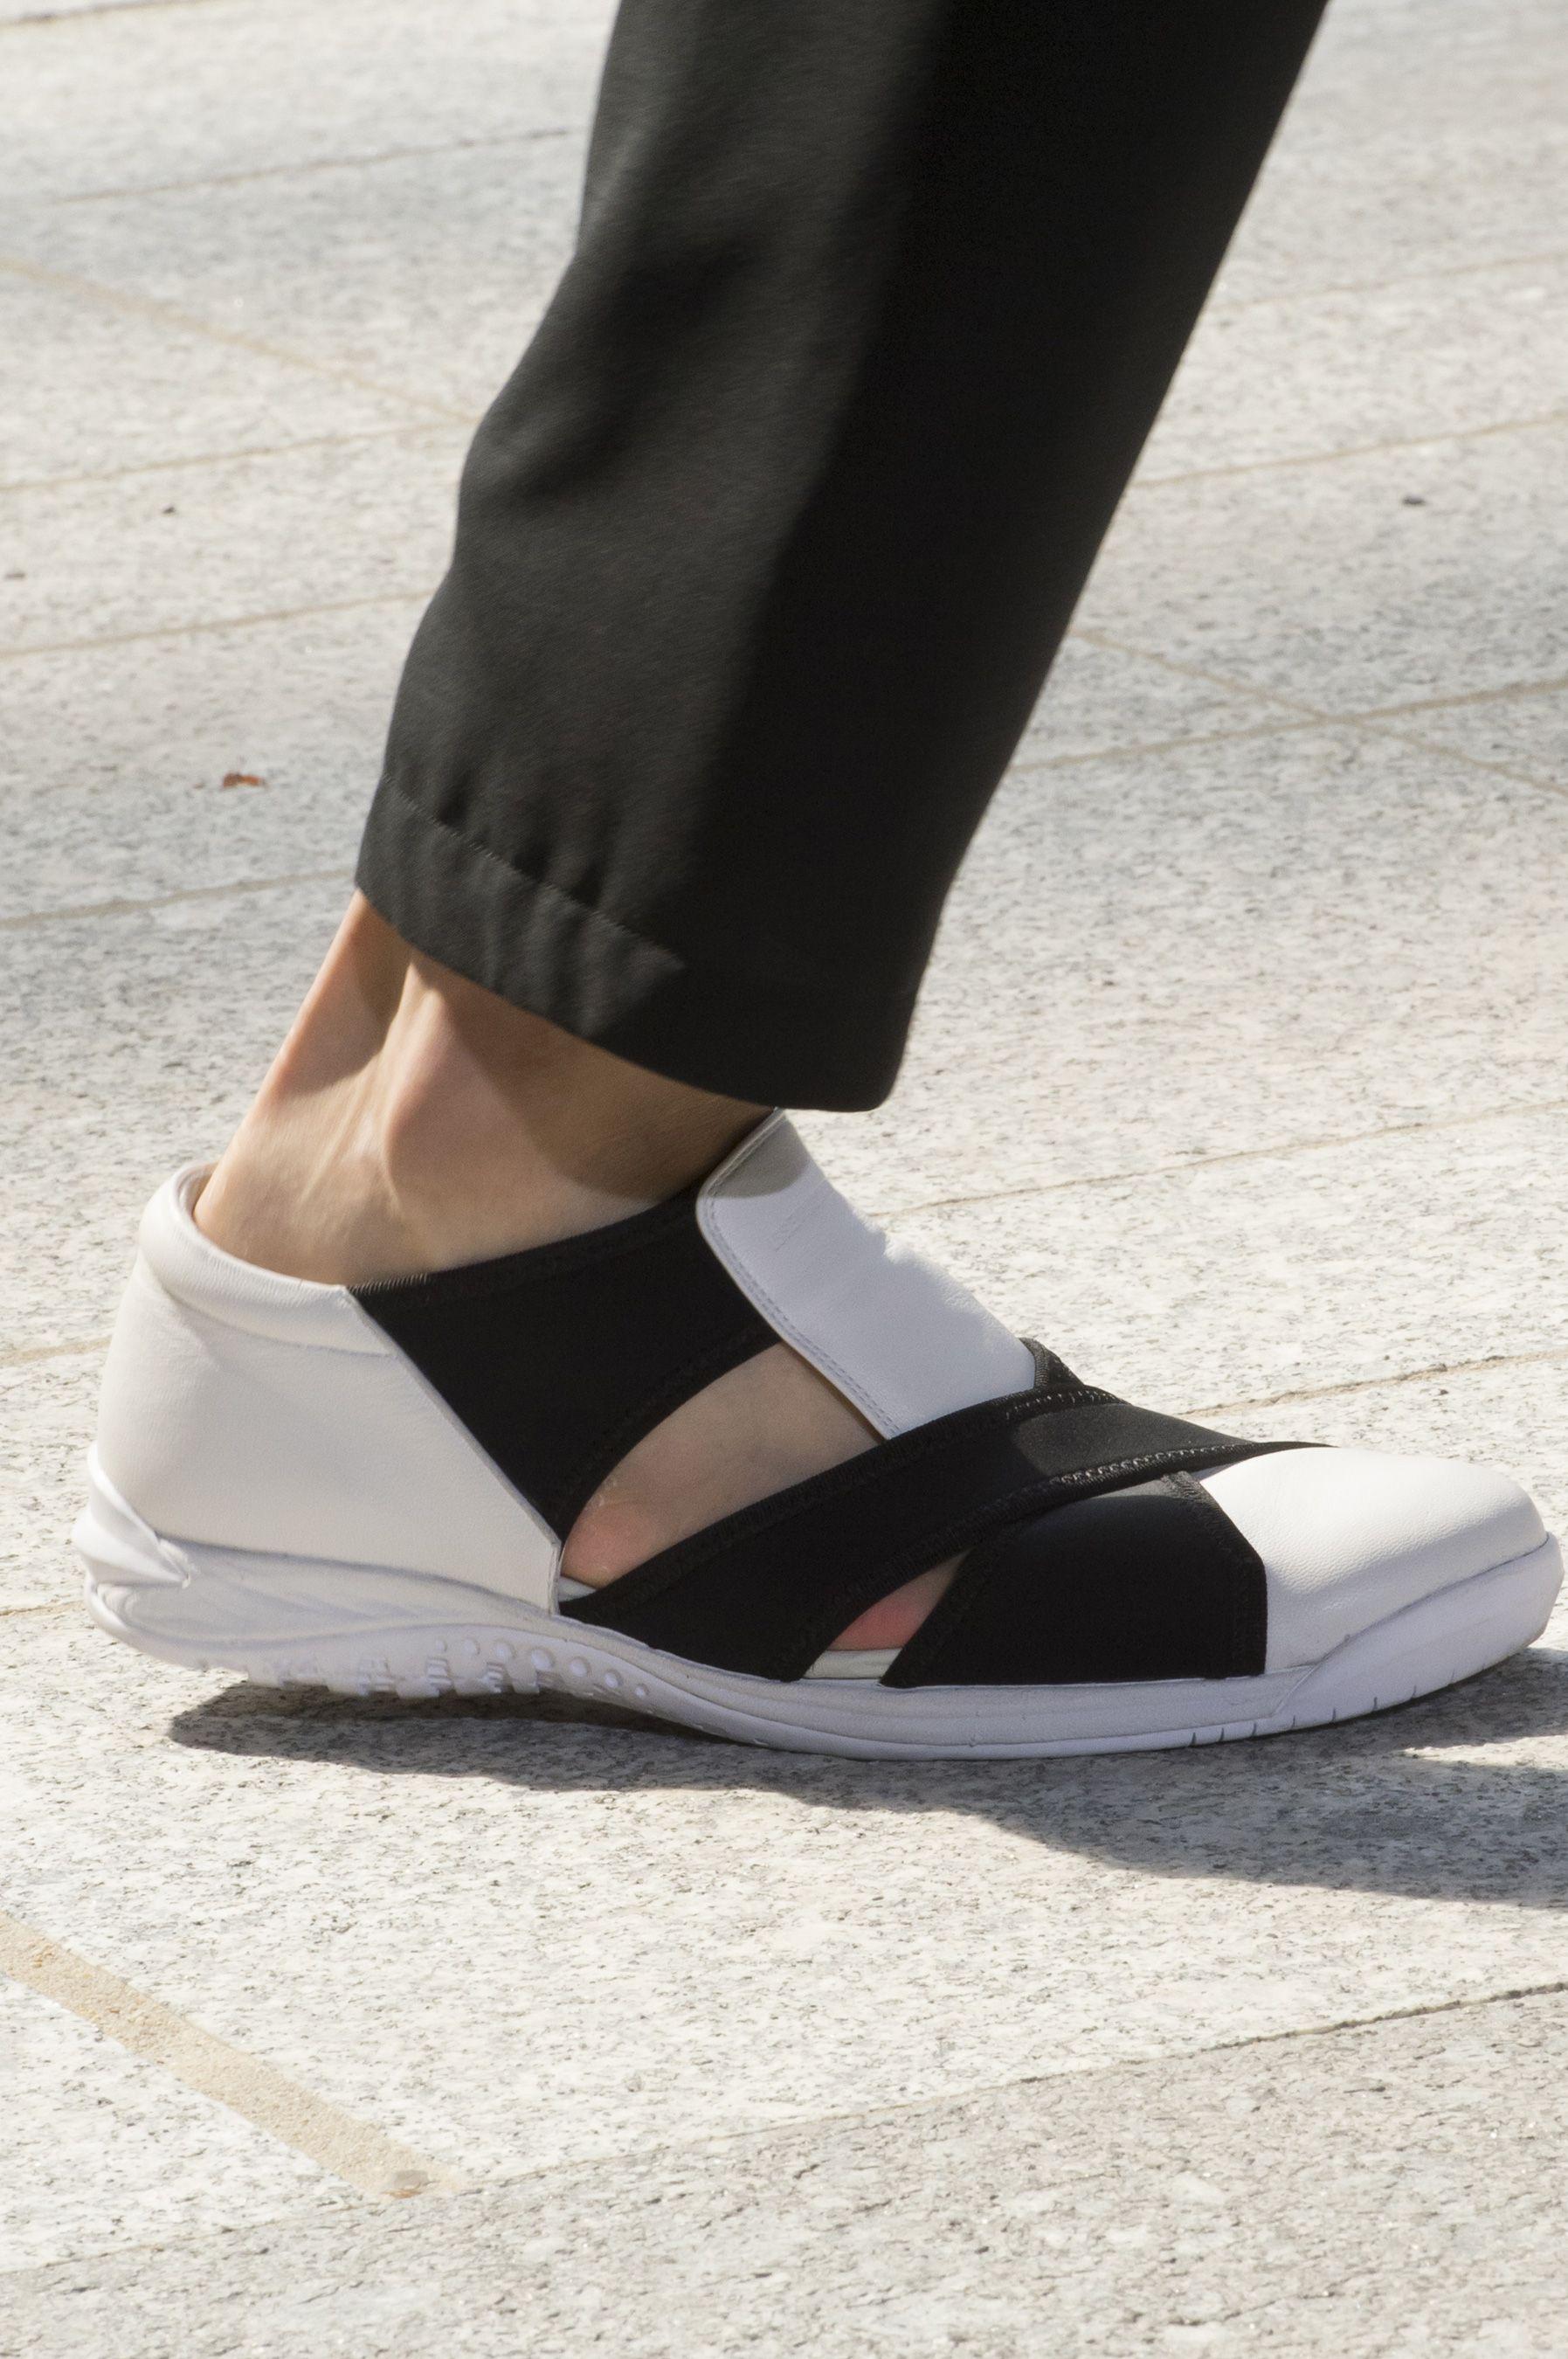 Fashion shoes, Mens leather sandals